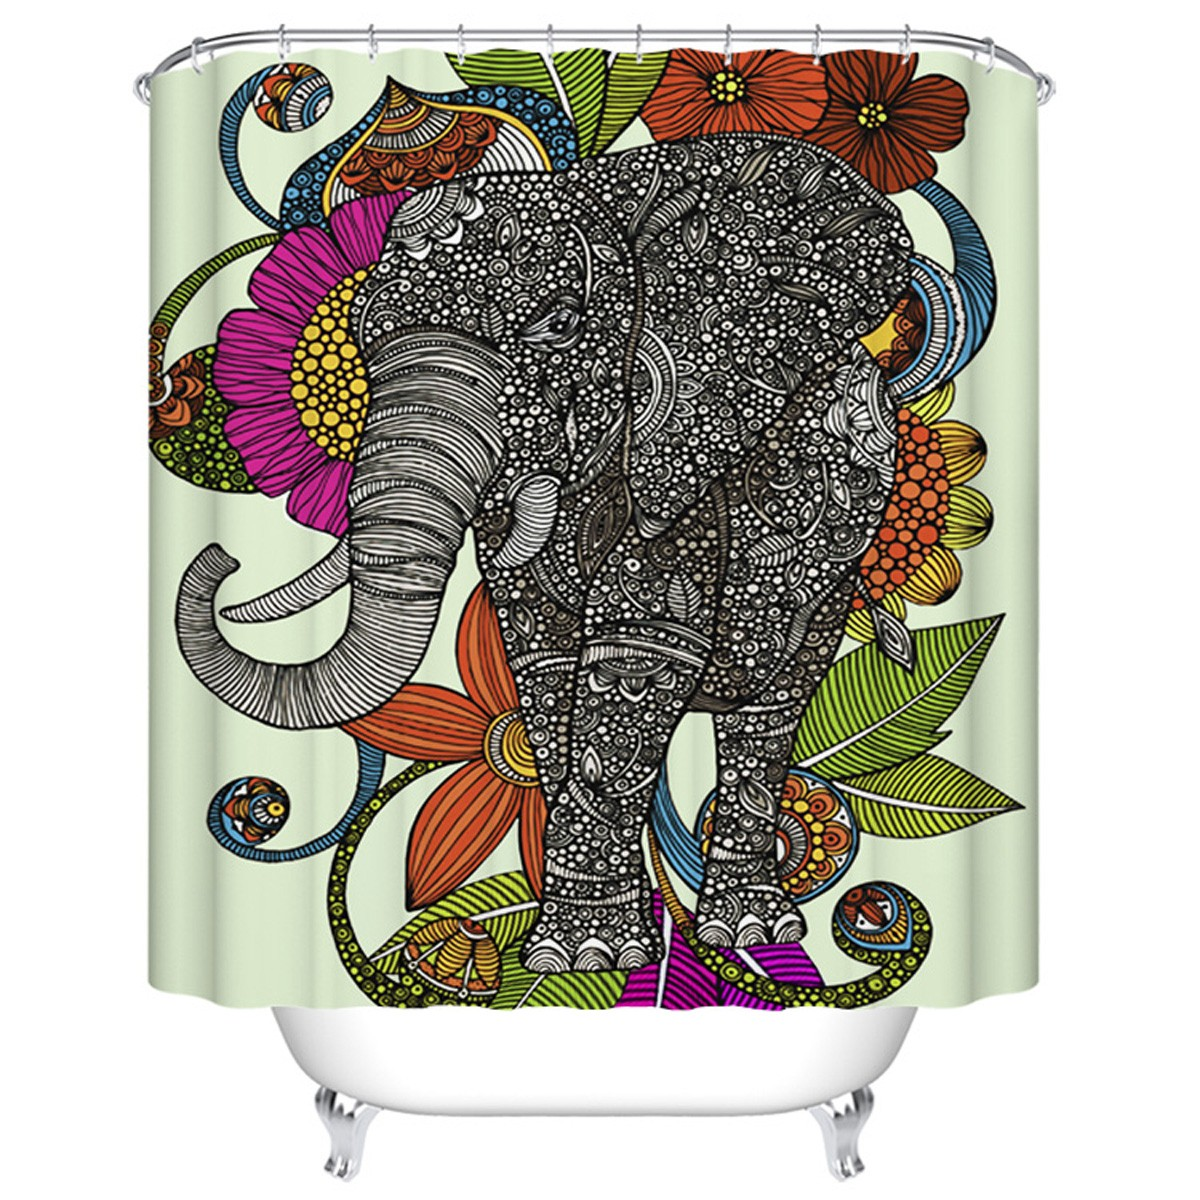 "Fashionable Bathroom Waterproof Shower Curtain, 70"" W x 72"" H (DK-YT034)"